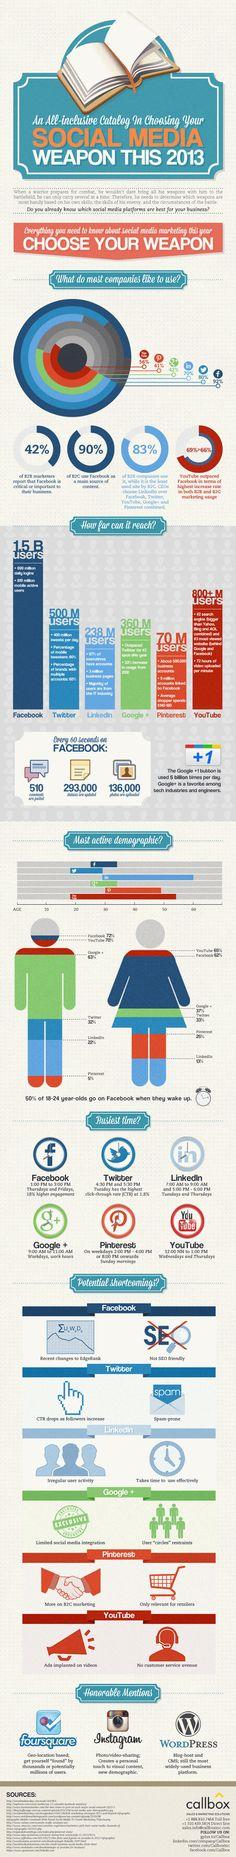 Elige tu mejor arma en Redes Sociales #infografia #infographic #socialmedia